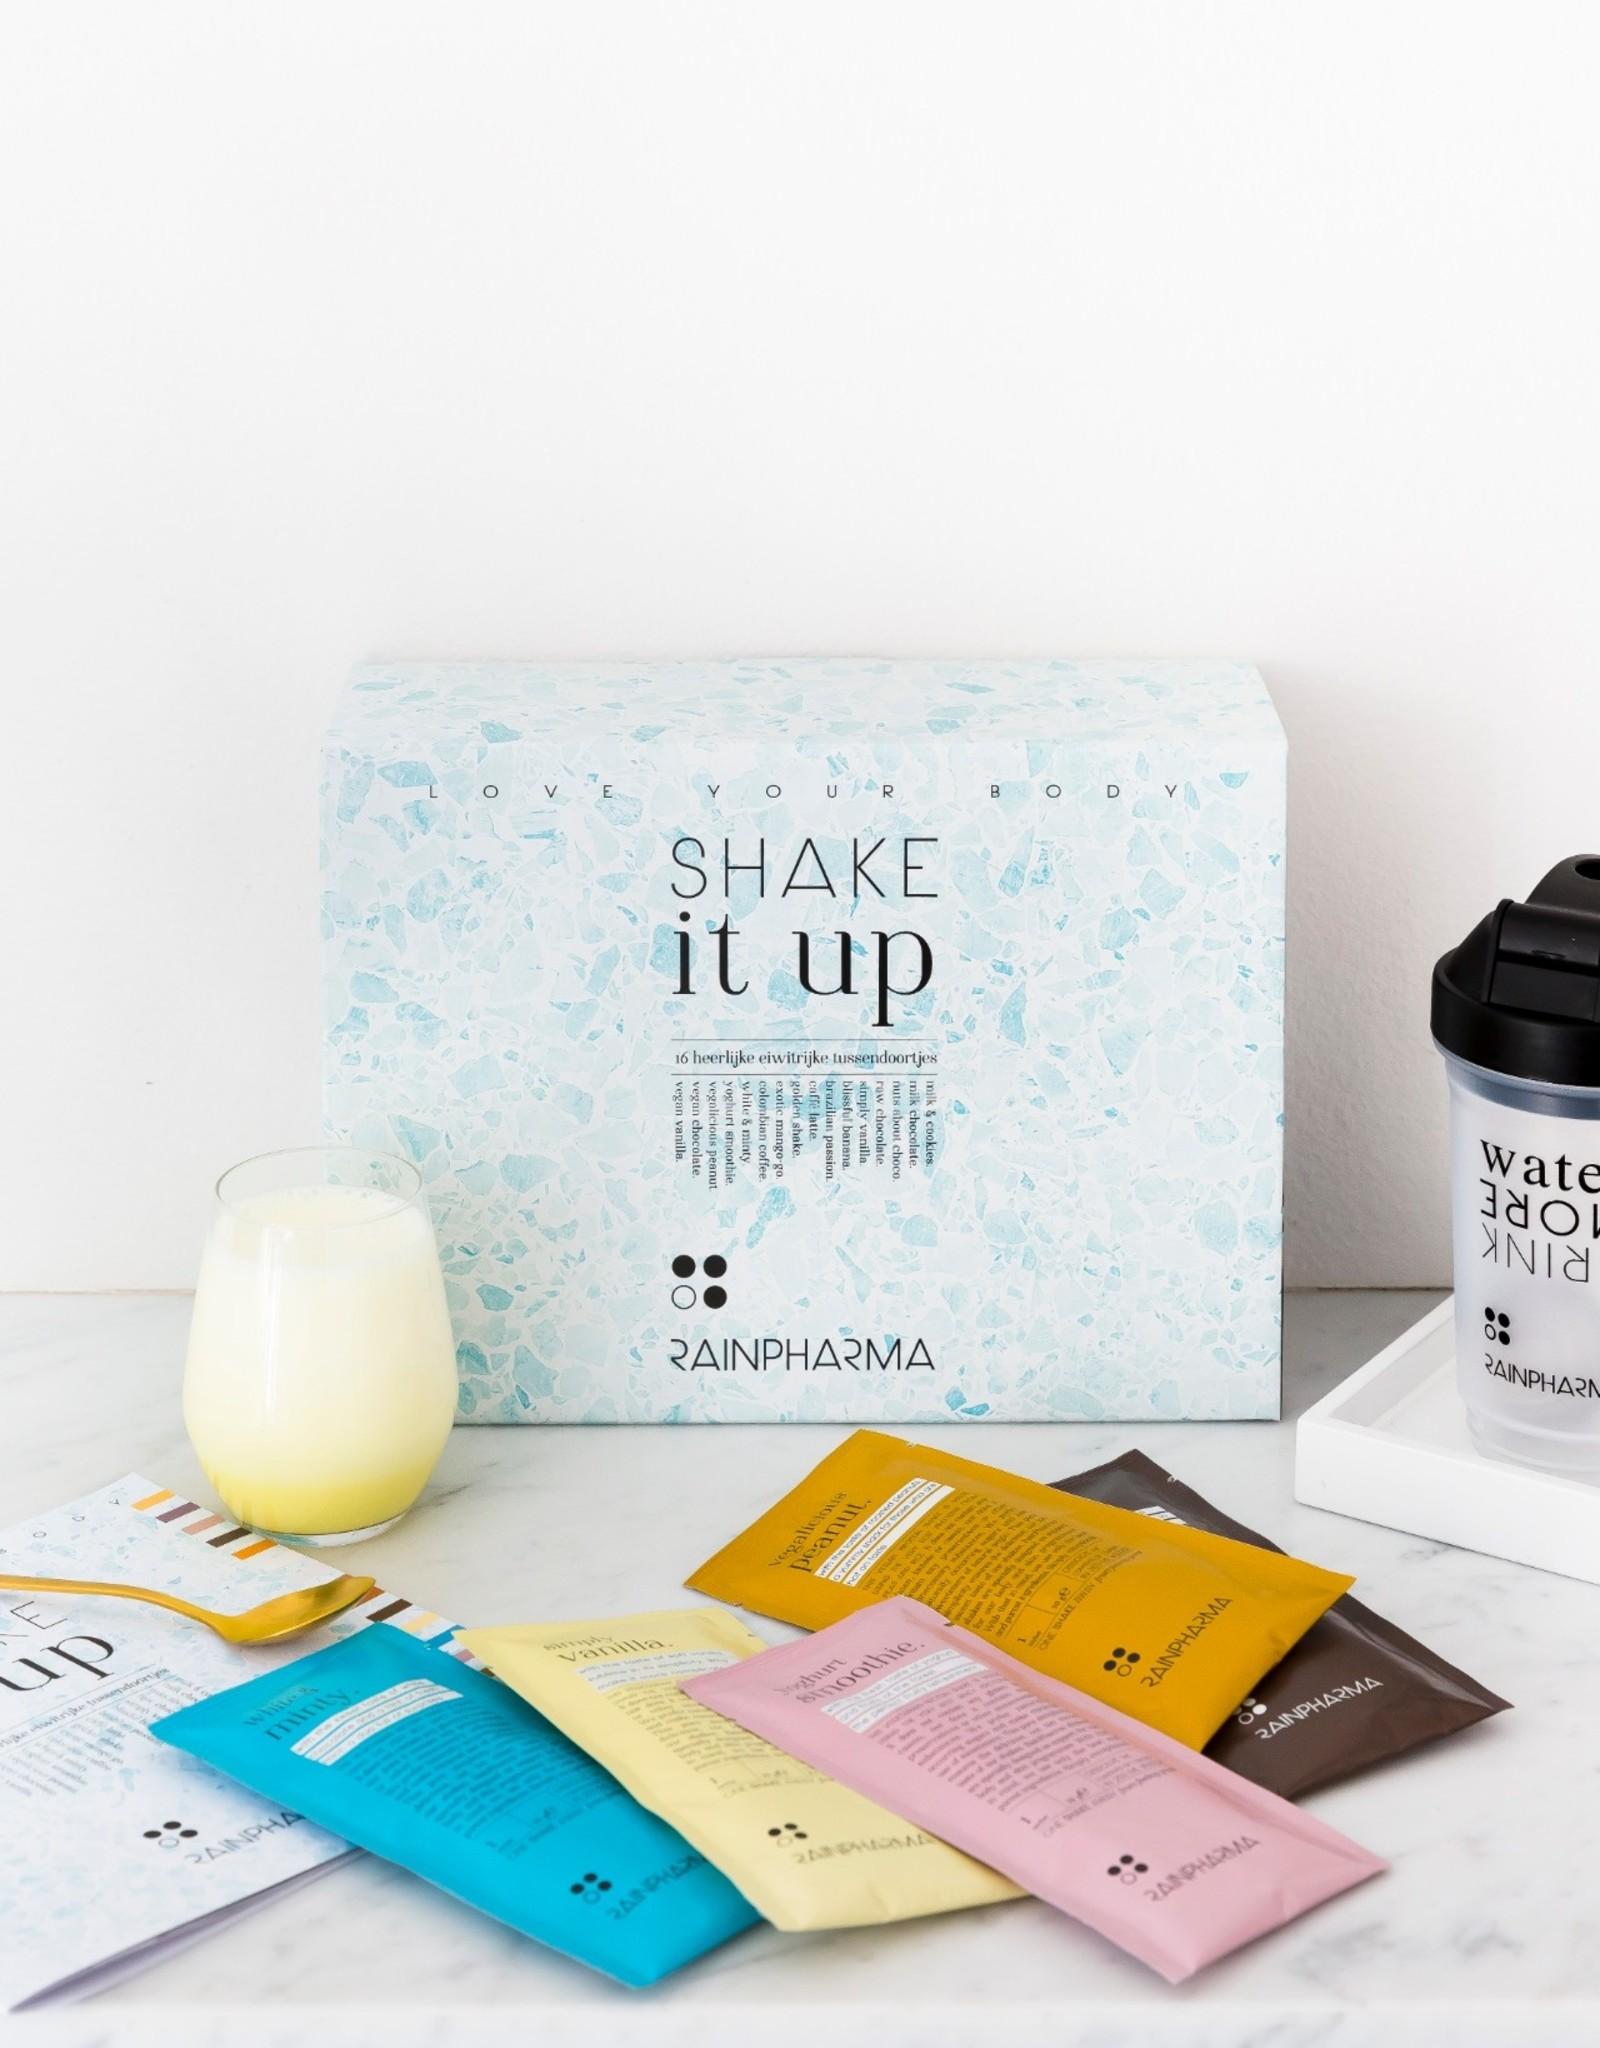 RainPharma LEUVEN Shake It Up Box